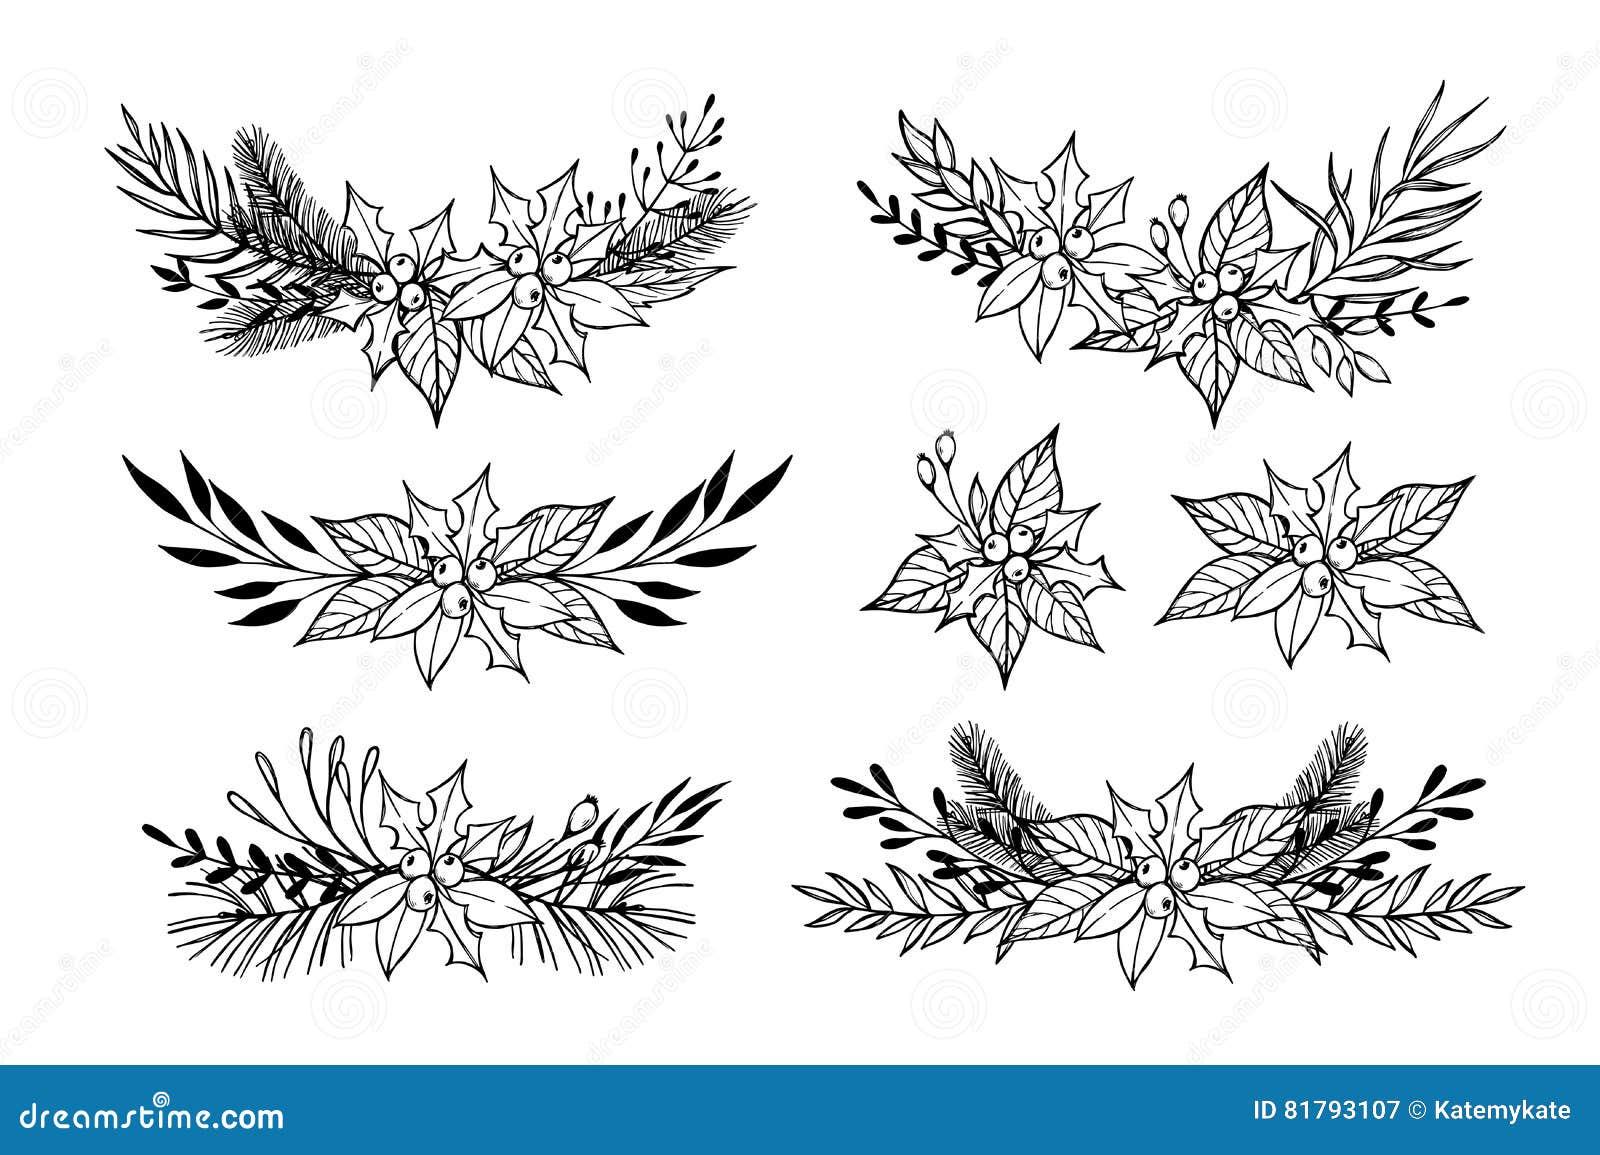 Hand Drawn Vector Set Of Winter Wreaths Laurel Leaf